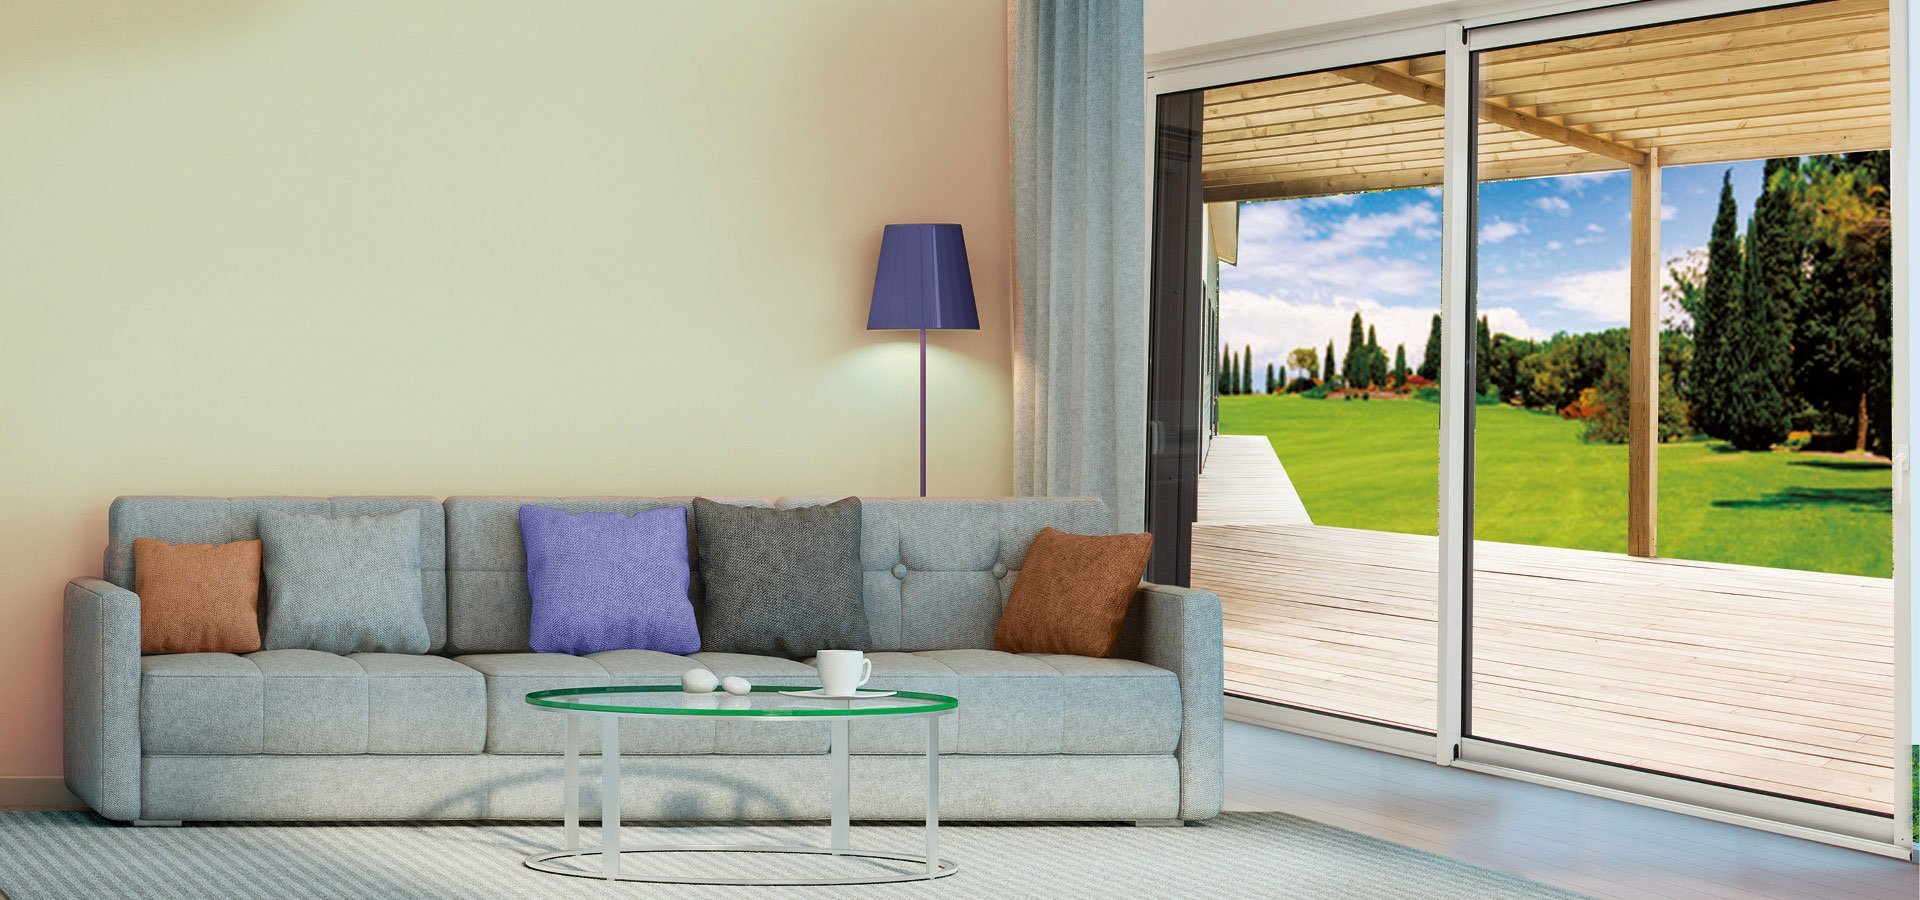 solutions baies vitr es coulissantes finesse confort et. Black Bedroom Furniture Sets. Home Design Ideas